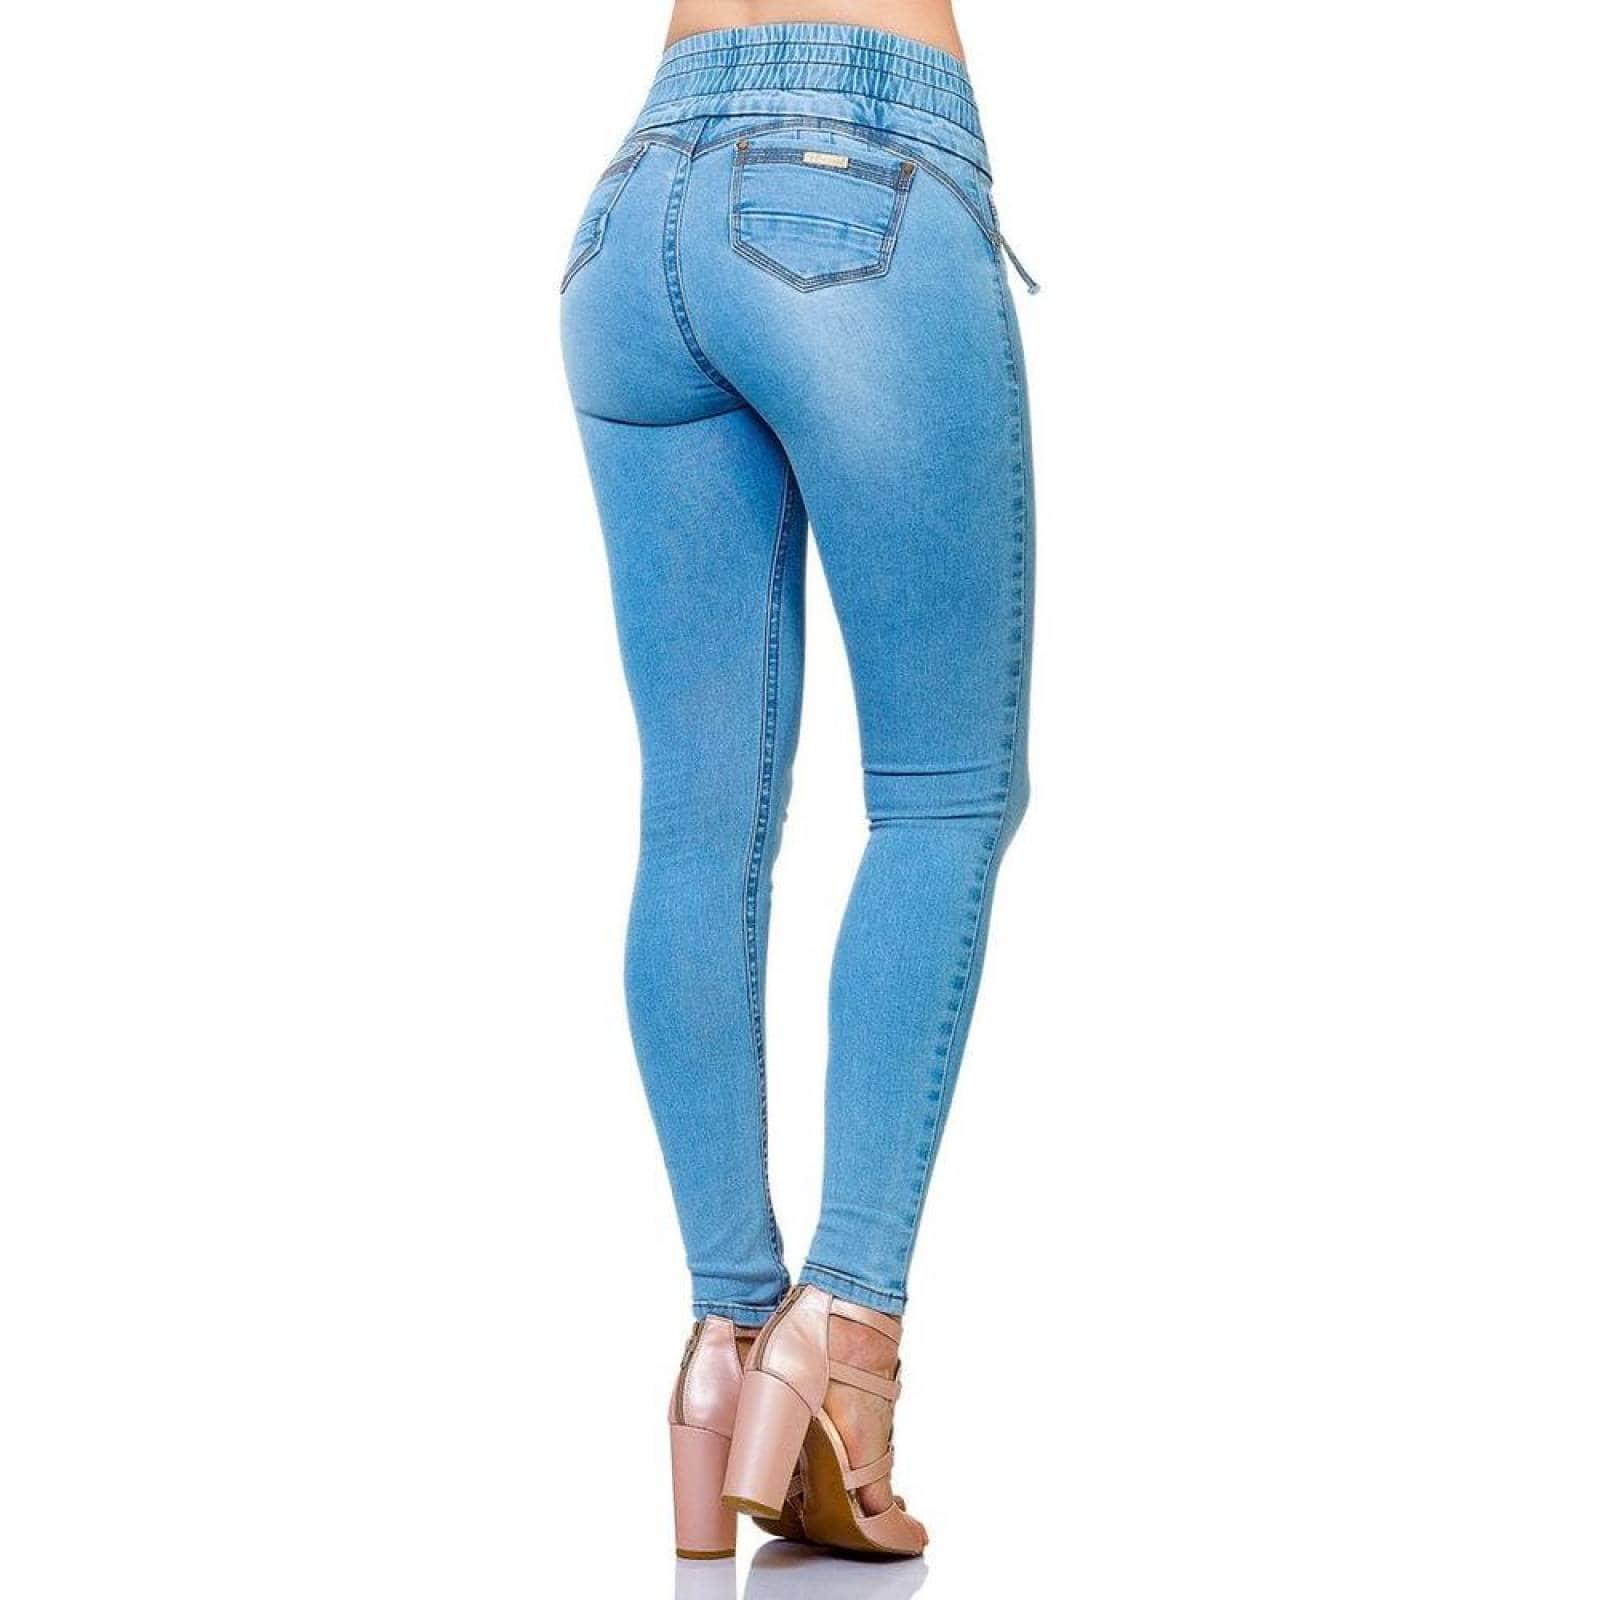 Jeans Moda Mujer Salvaje Tentacion Bleach 71803110 Mezclilla Stretch